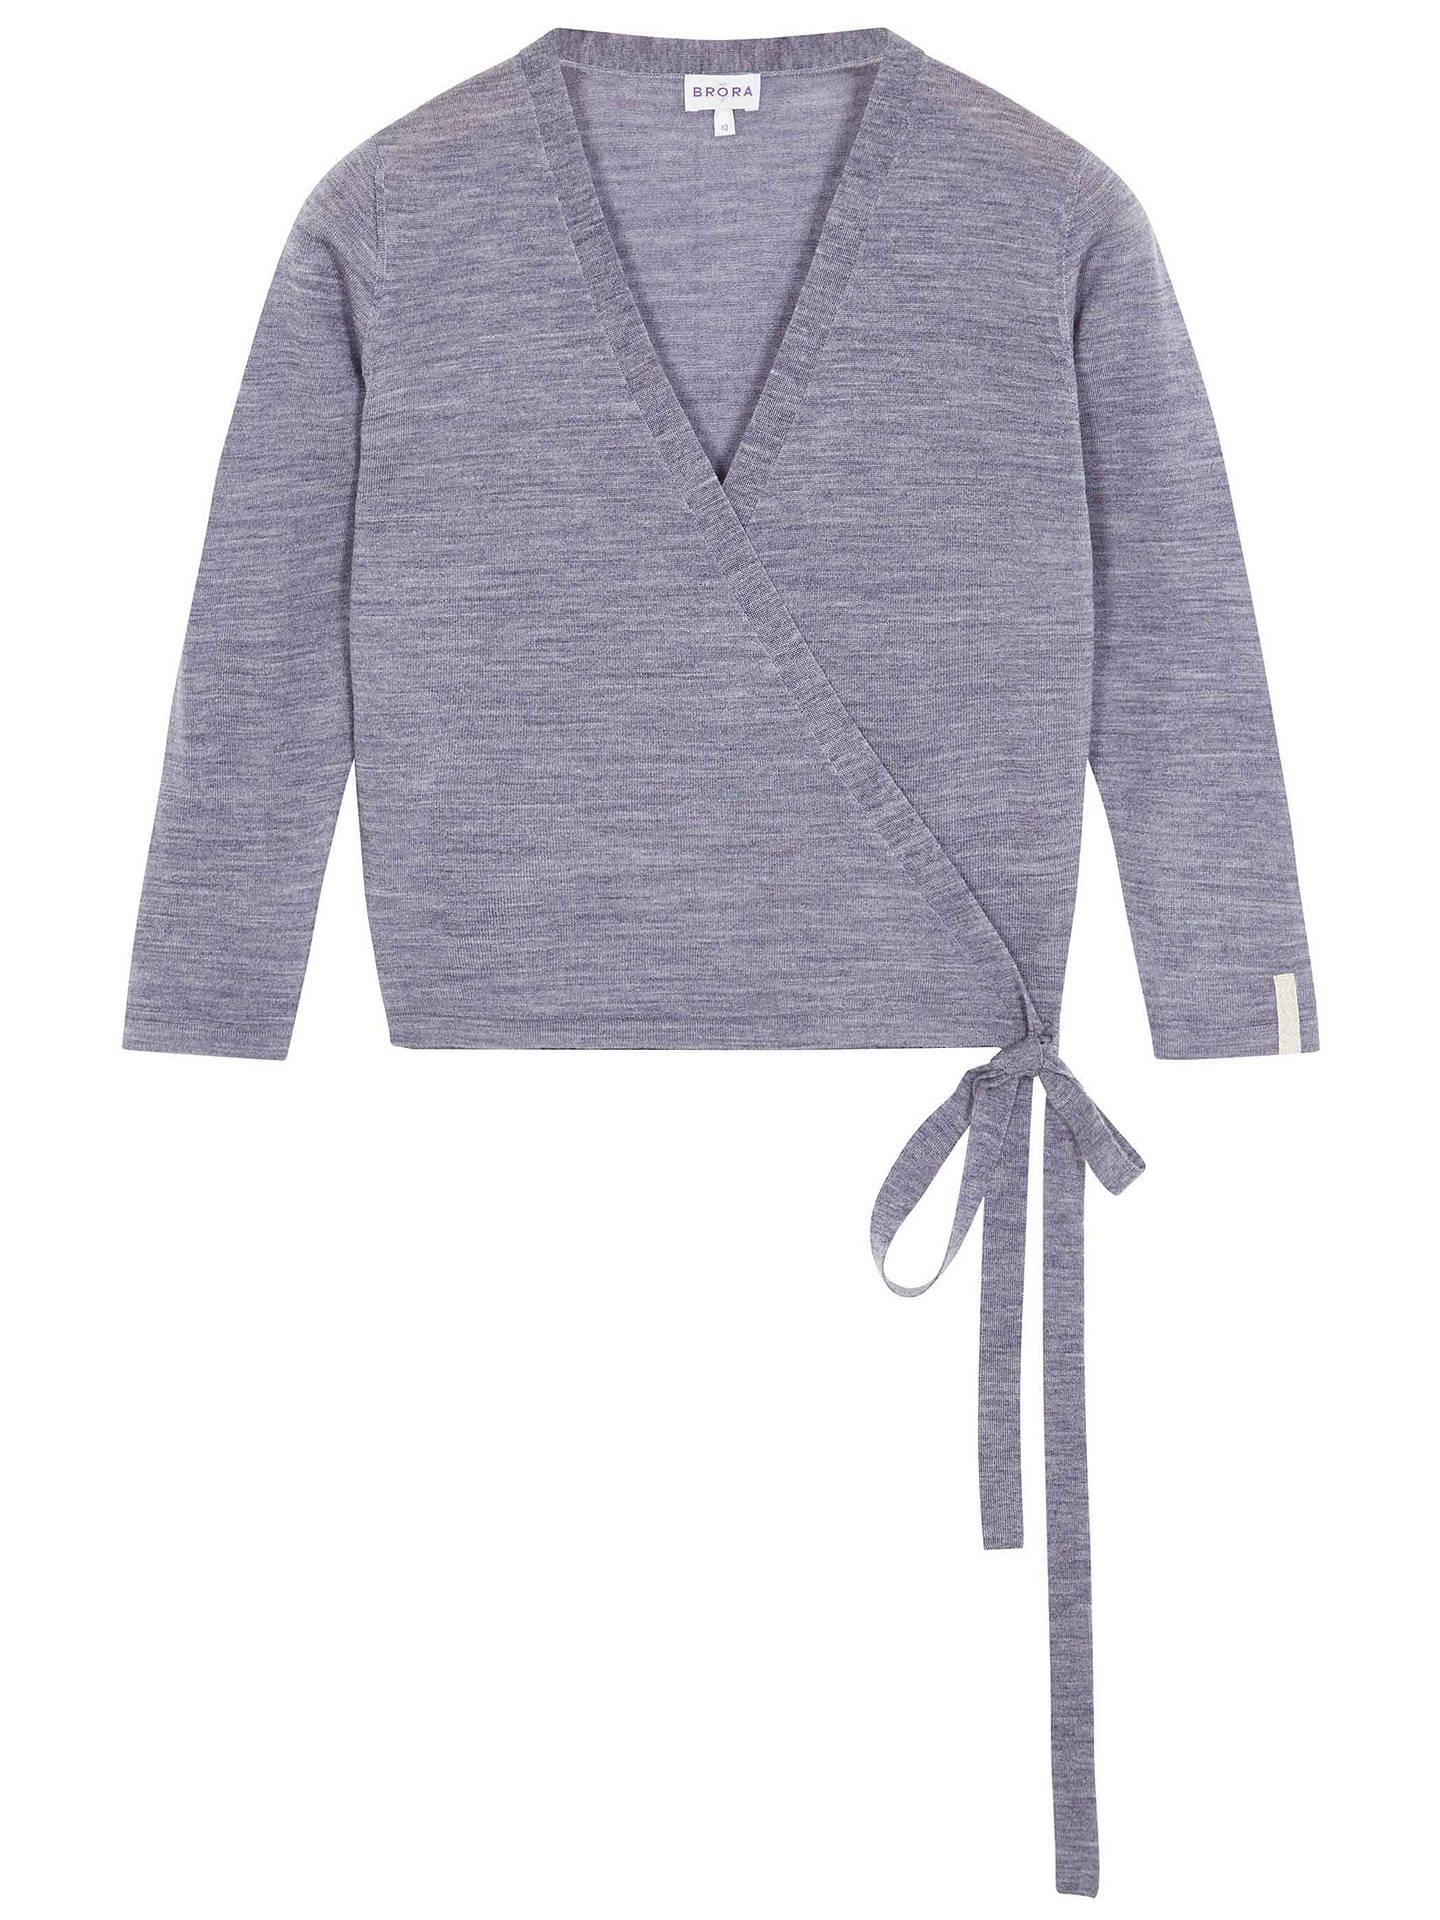 b4cee78a4f ... Buy Brora Merino Wool Ballet Wrap Cardigan